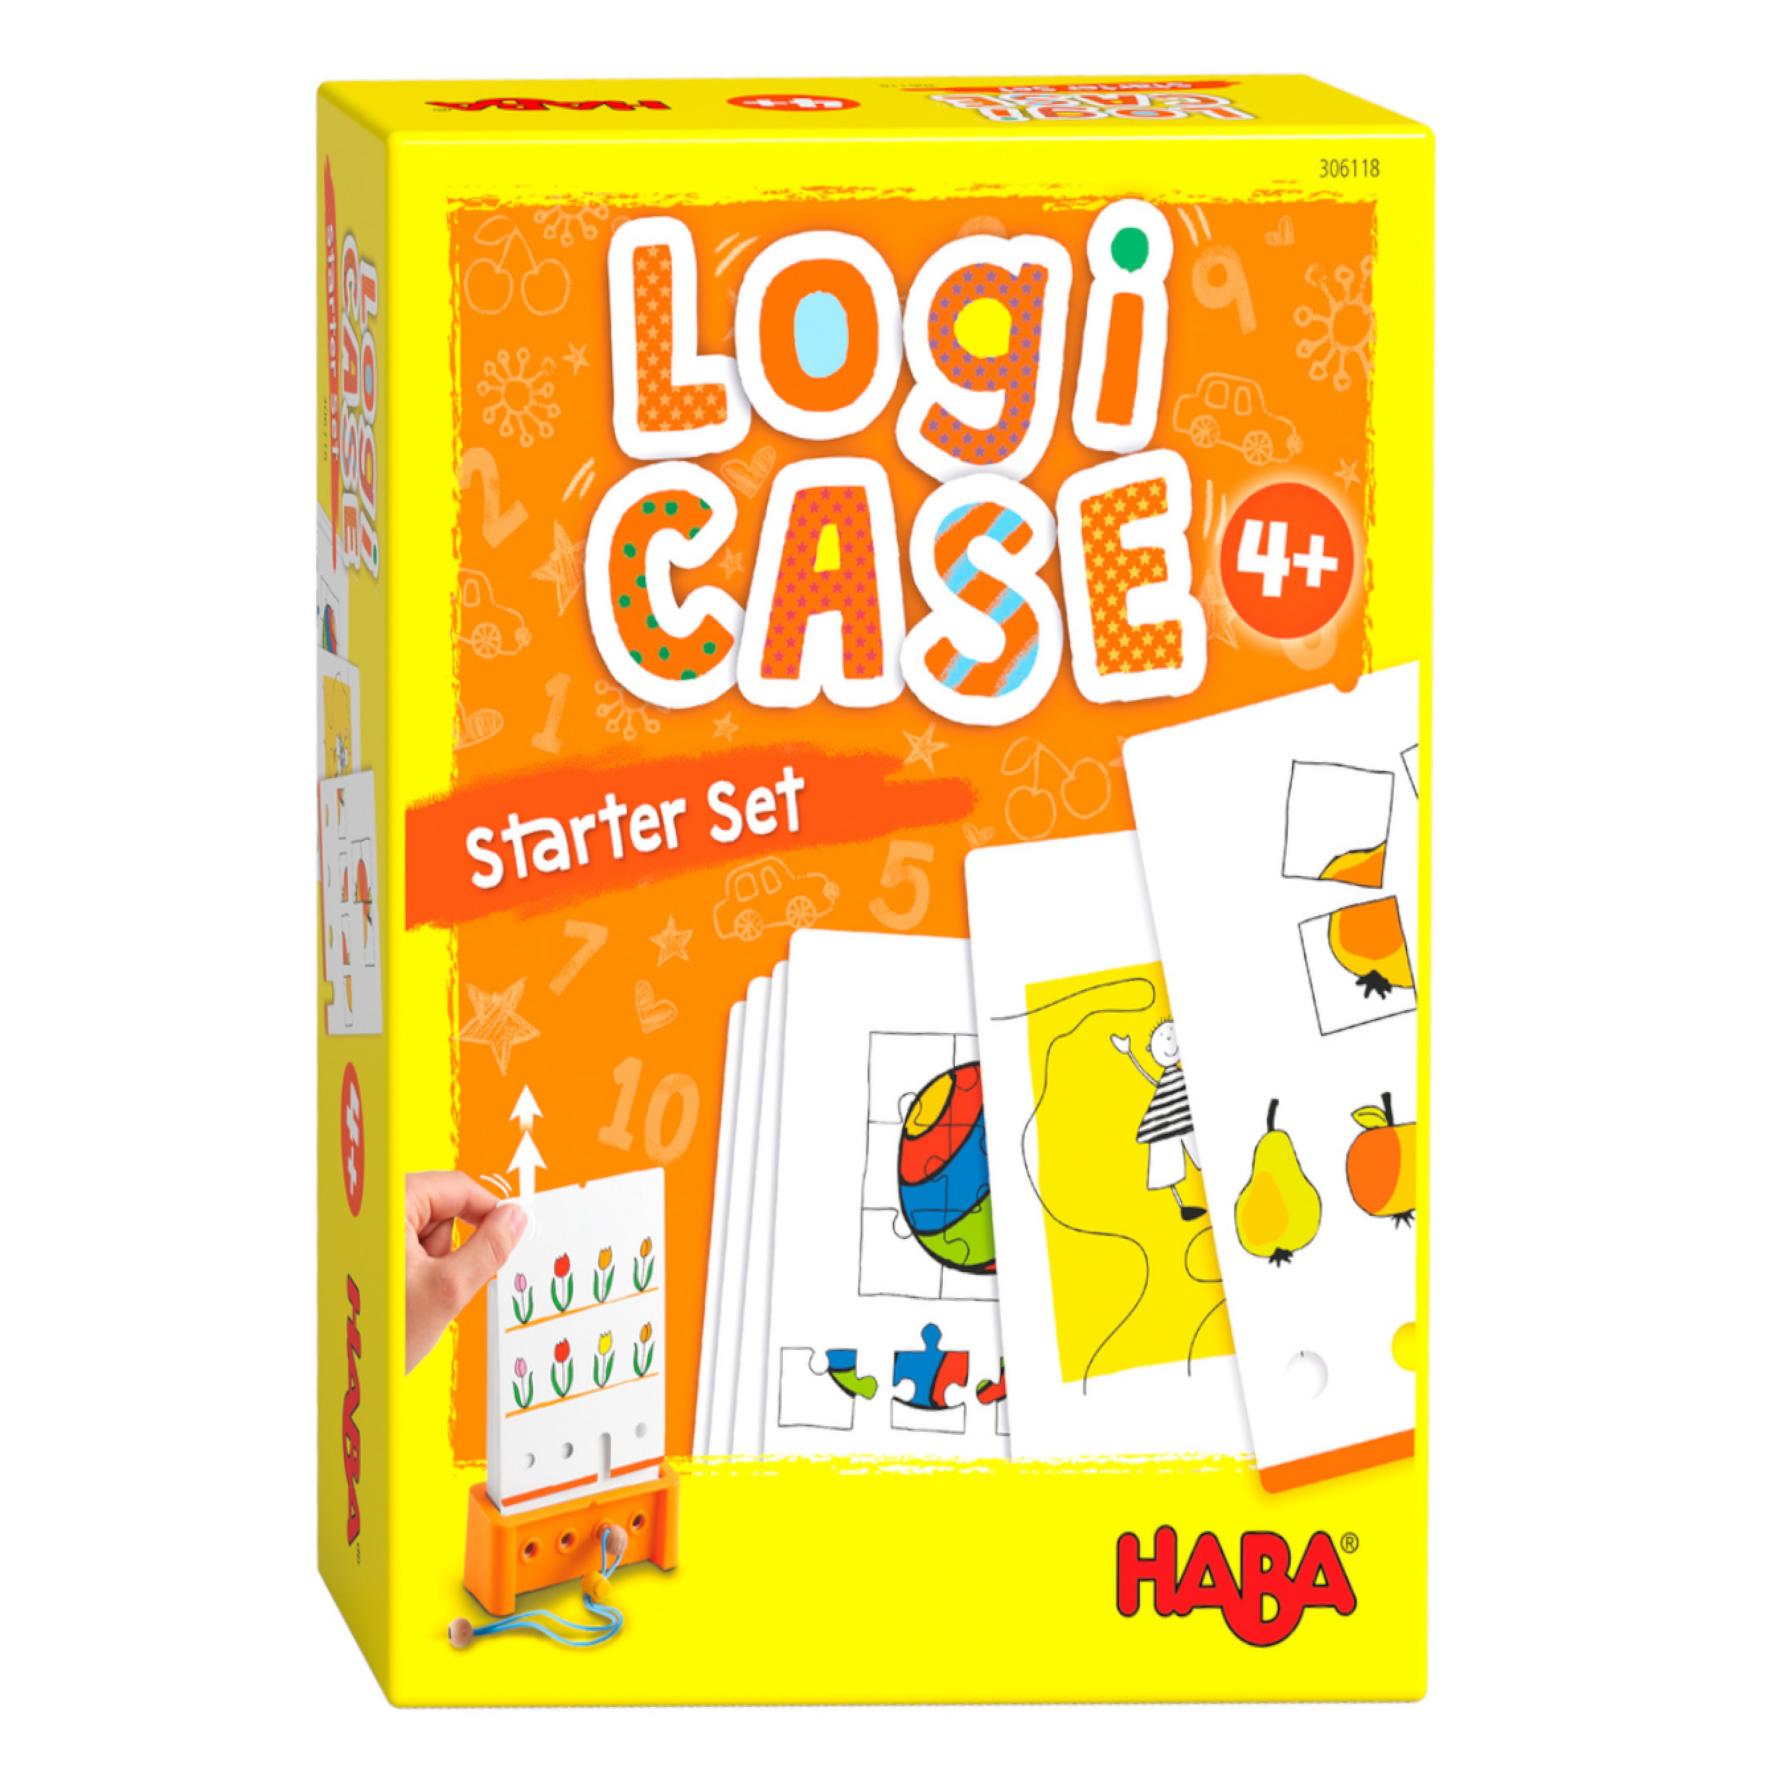 Spel - LogiCASE - Startersset - 4+